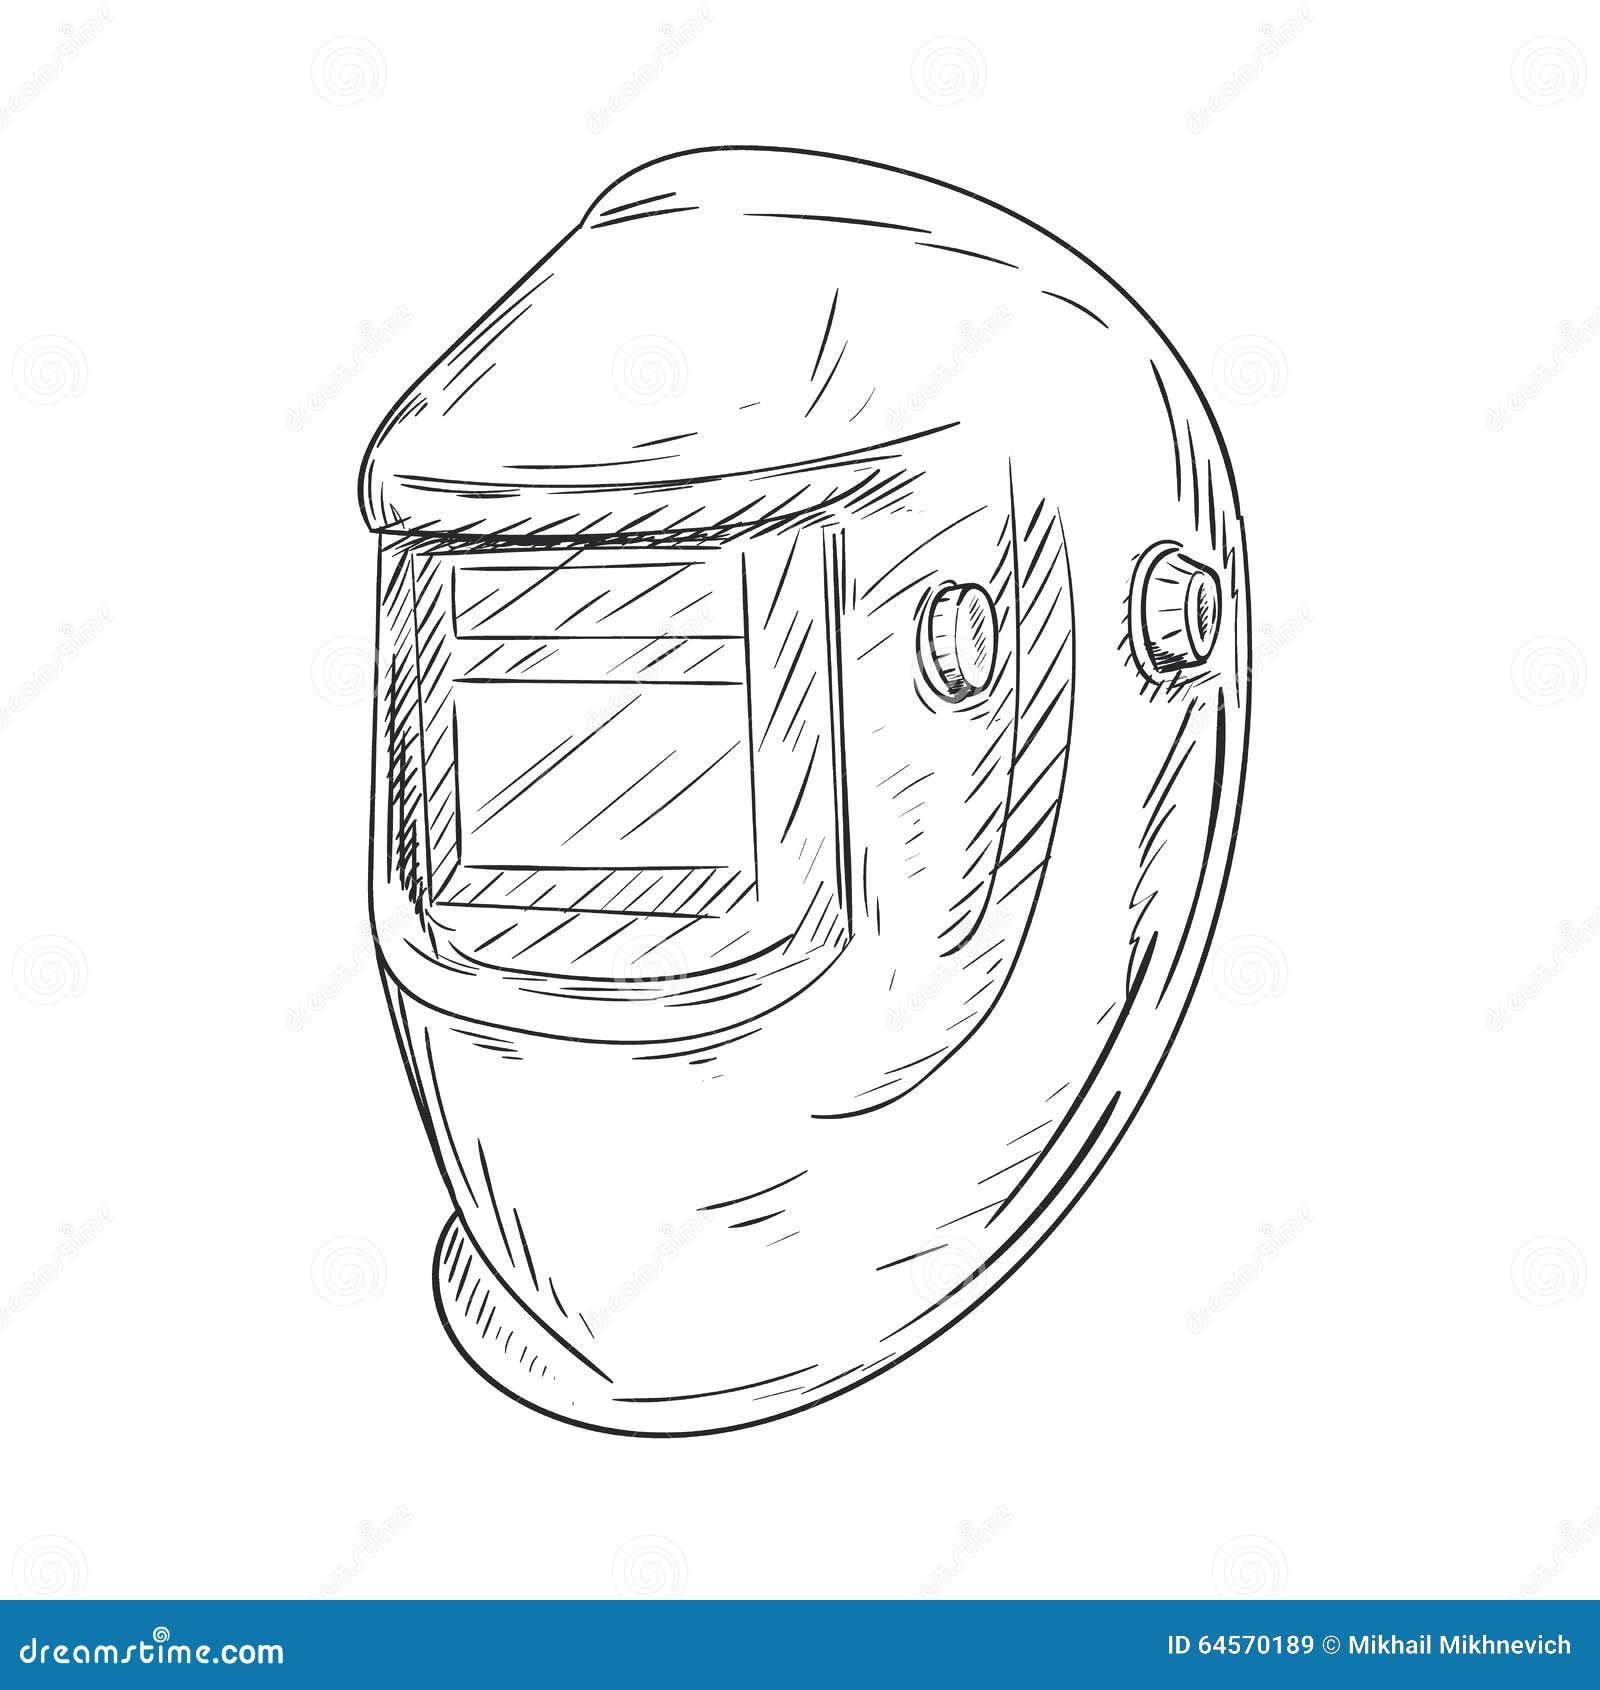 Welding Helmet Sketch Stock Illustrations – 24 Welding Helmet Sketch Stock  Illustrations, Vectors & Clipart - DreamstimeDreamstime.com